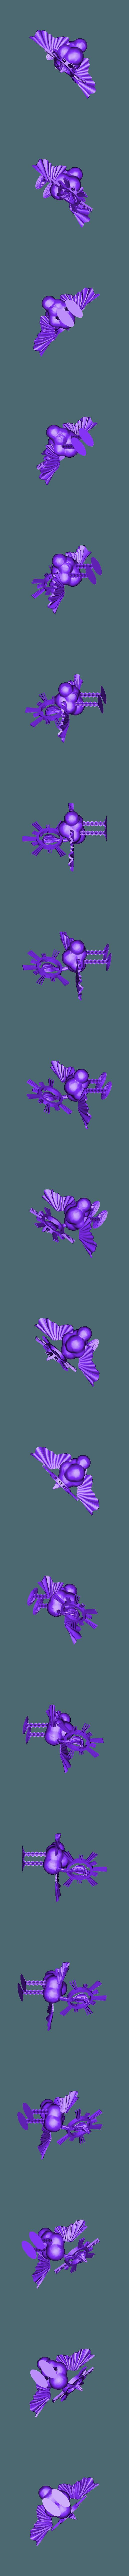 snakecloudstrusch2fix.stl Télécharger fichier STL gratuit serpent strauss • Design imprimable en 3D, syzguru11